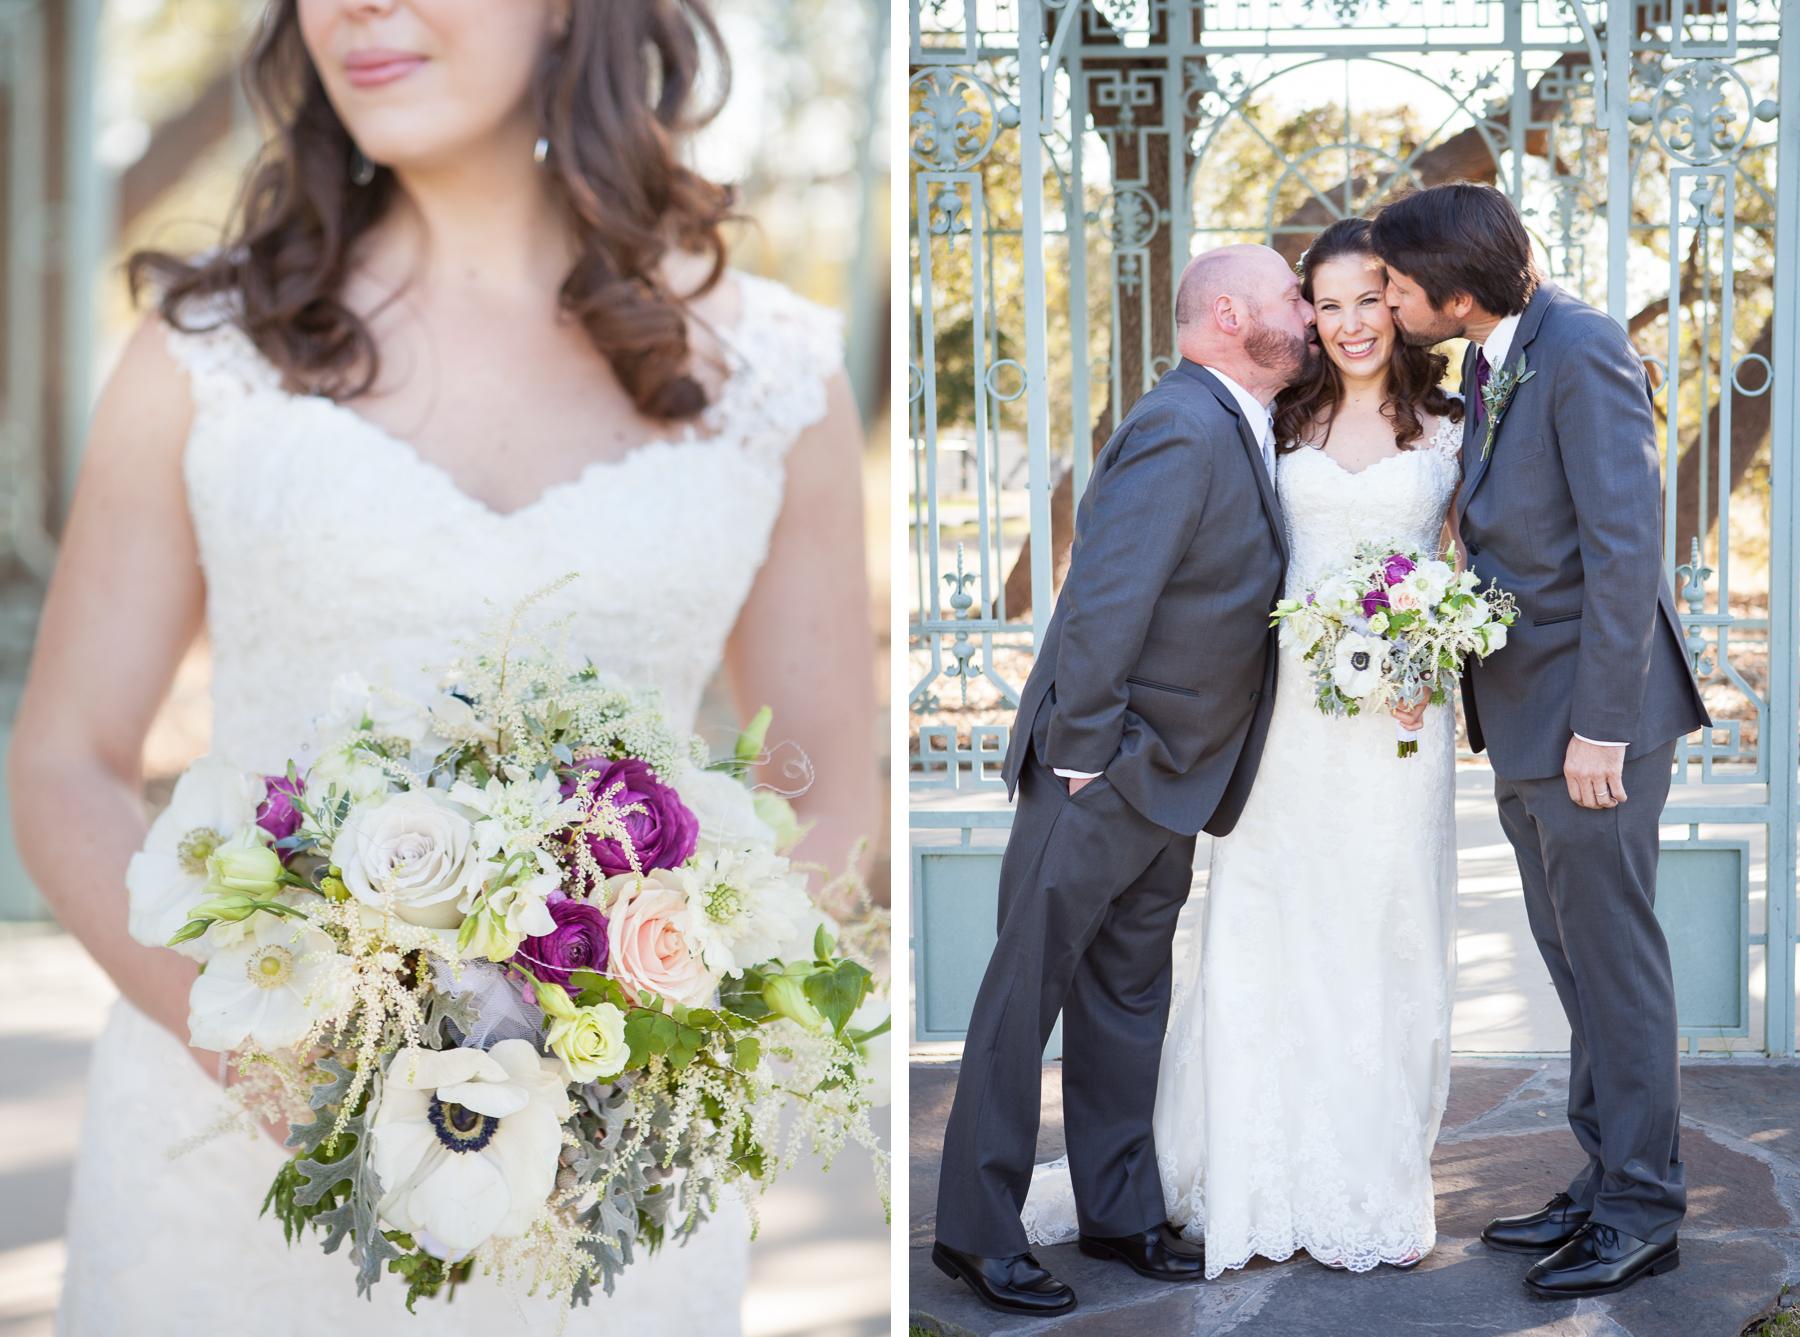 Ranunculus-anenome-wedding-bouquet.jpg